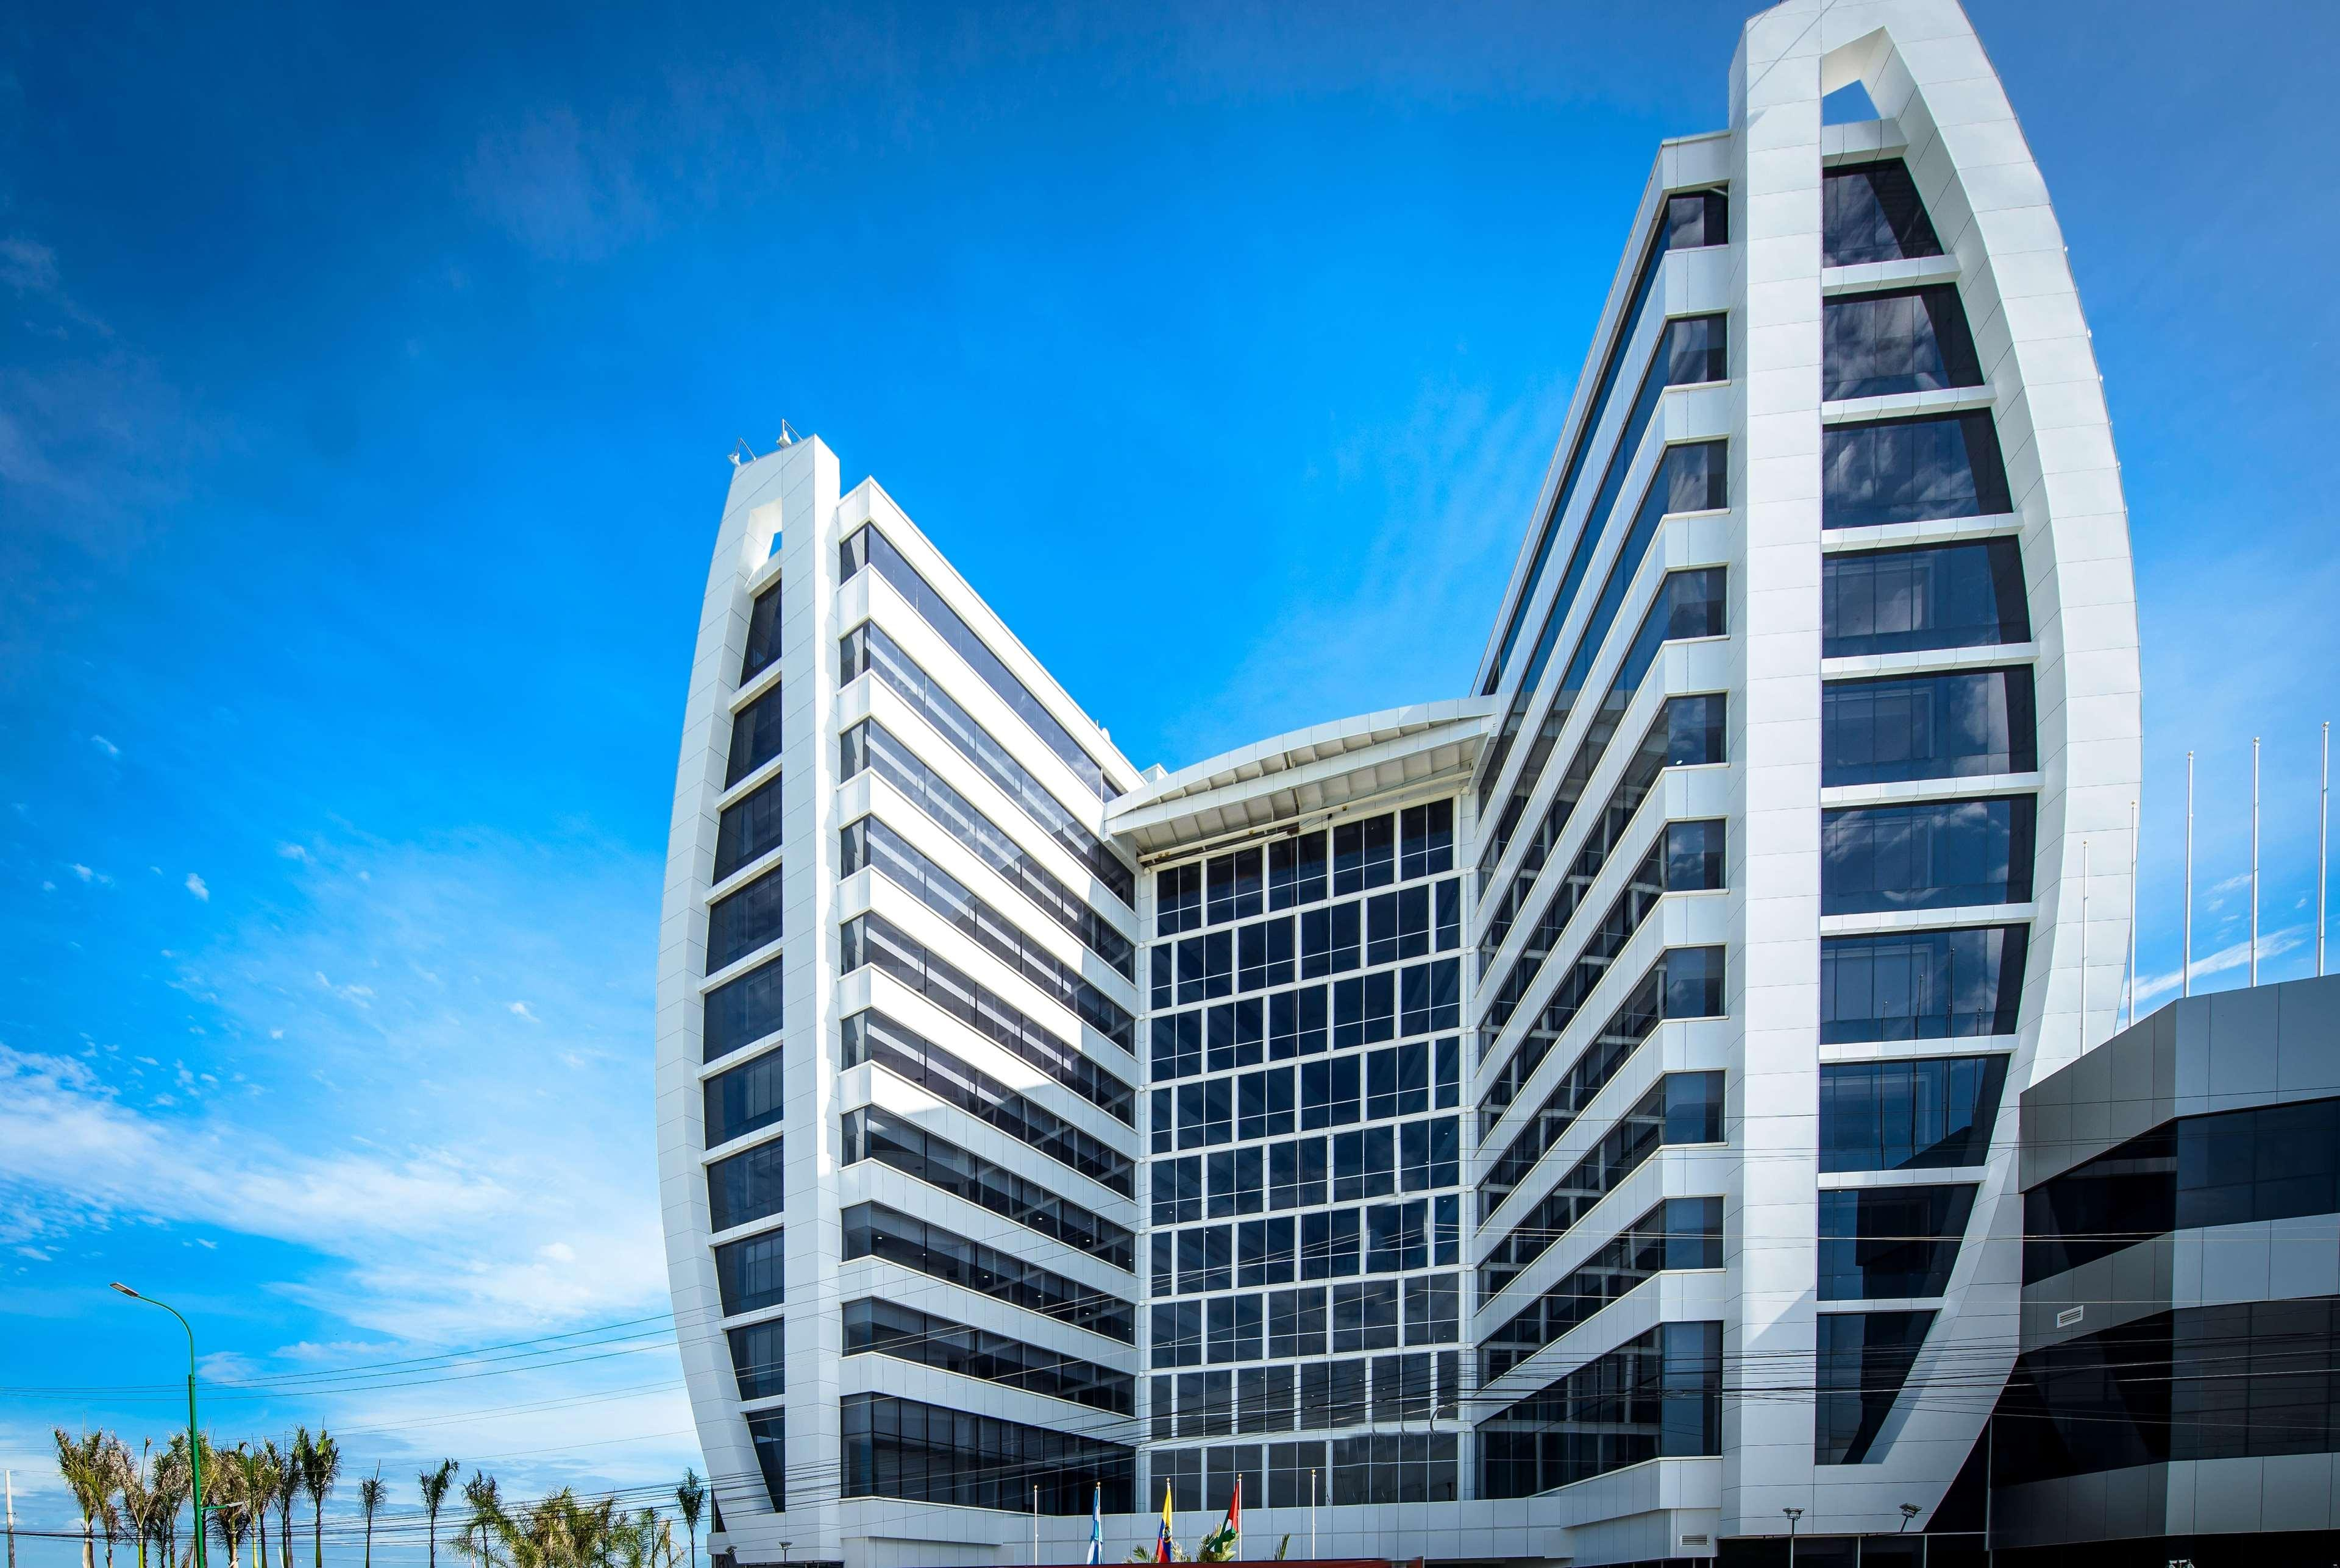 Wyndham Manta Sail Plaza Hotel Convention C, Manta